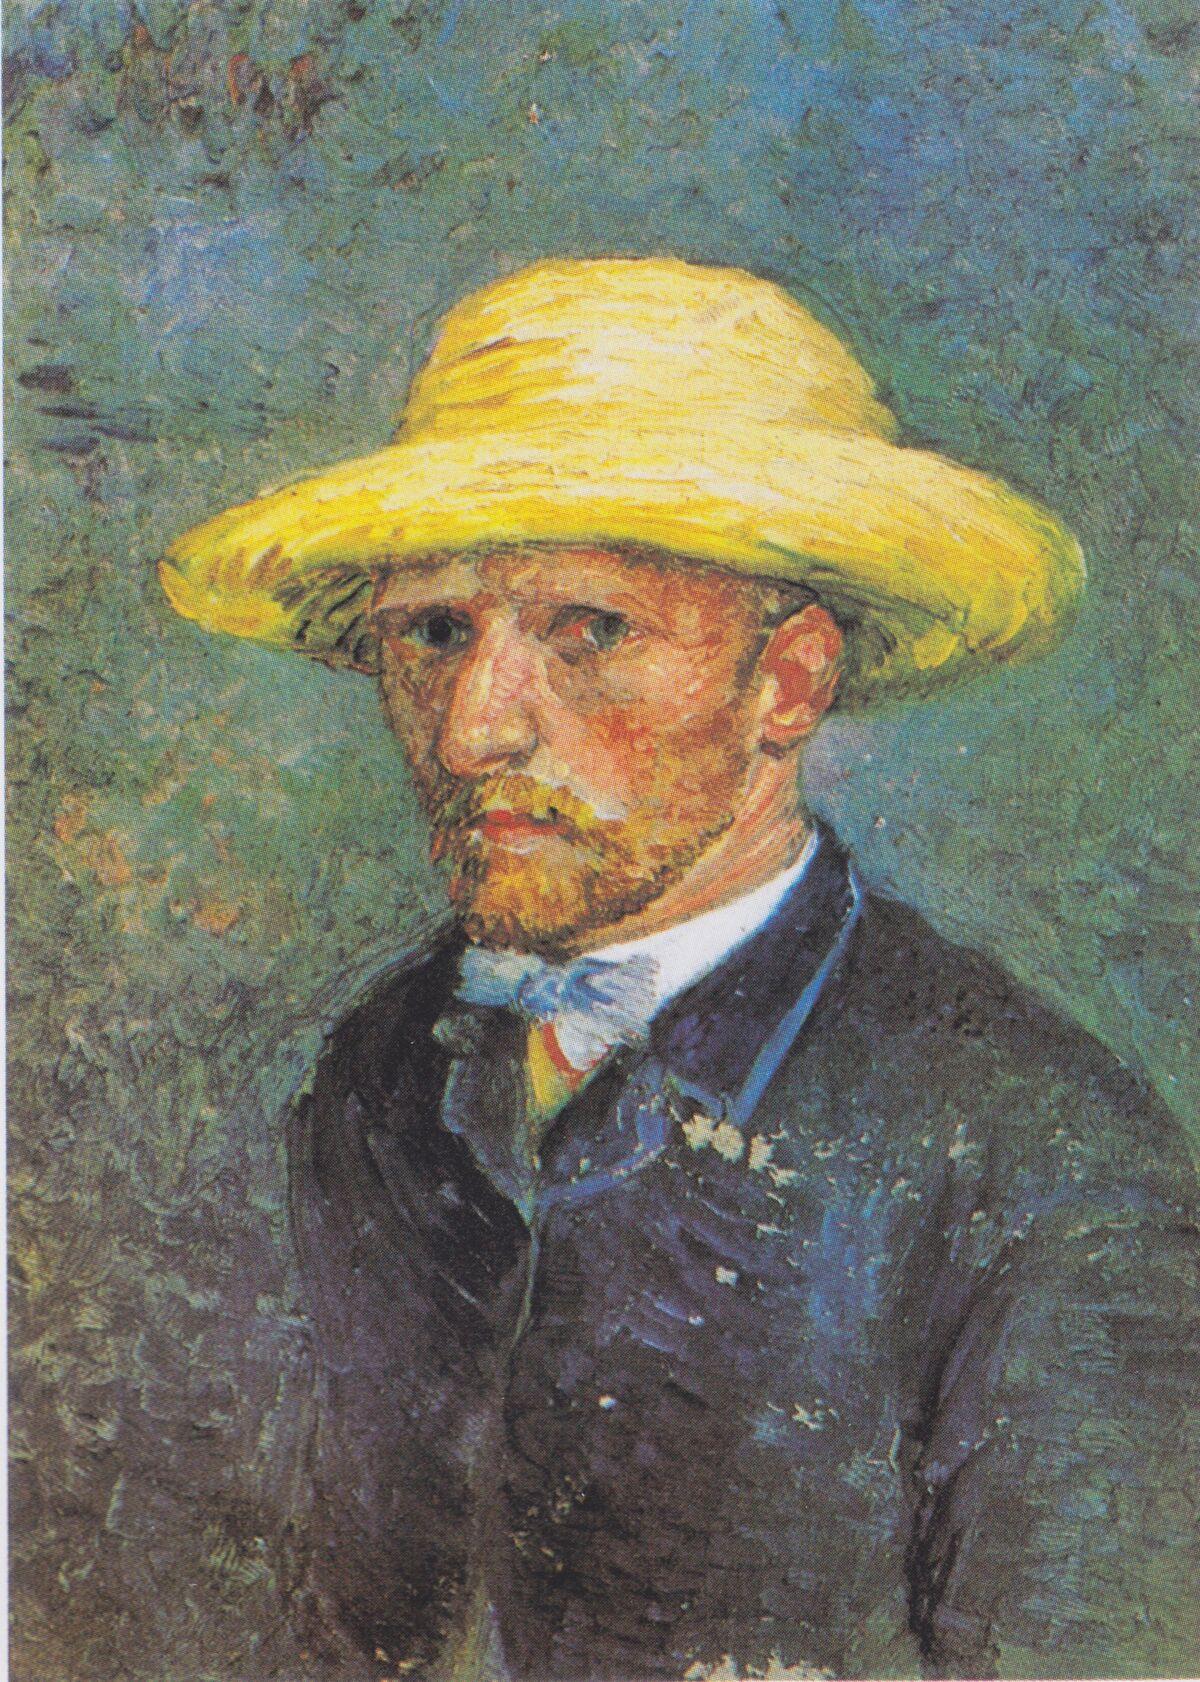 Vincent van Gogh, Portrait of Theo van Gogh, 1887. Photo via Wikimedia Commons.